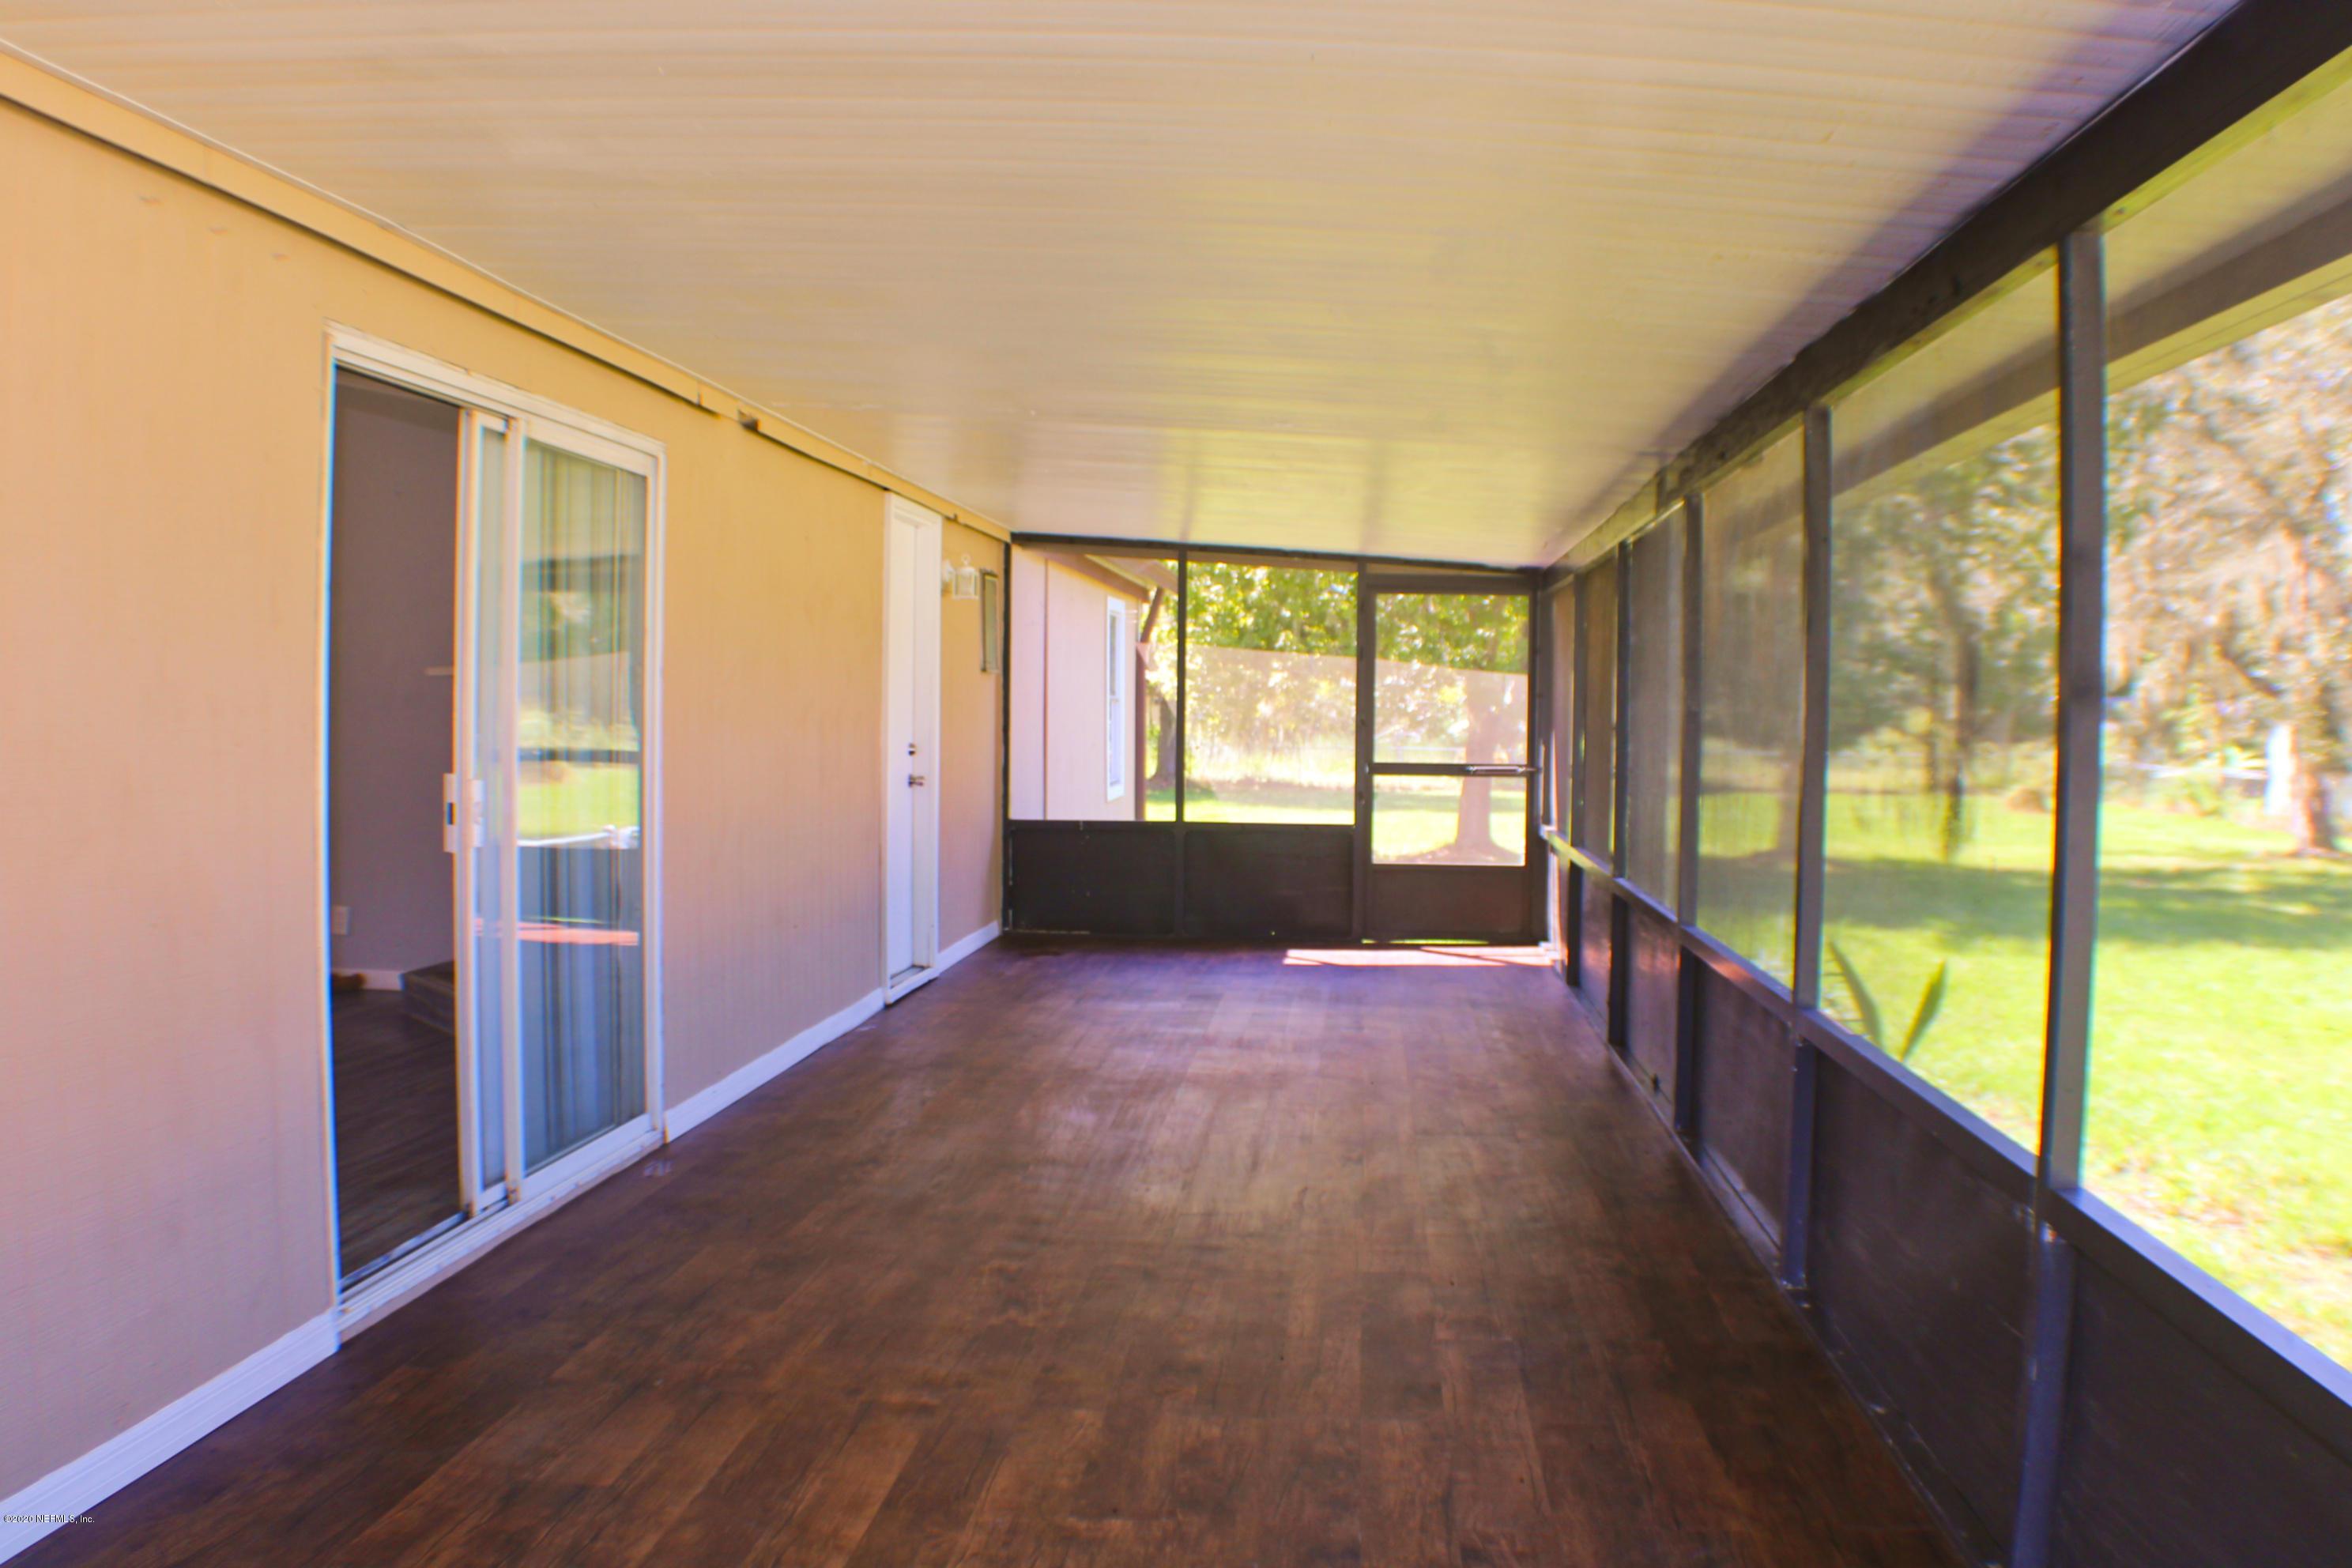 108 PINESHORE, SATSUMA, FLORIDA 32189, 3 Bedrooms Bedrooms, ,2 BathroomsBathrooms,Residential,For sale,PINESHORE,1076052